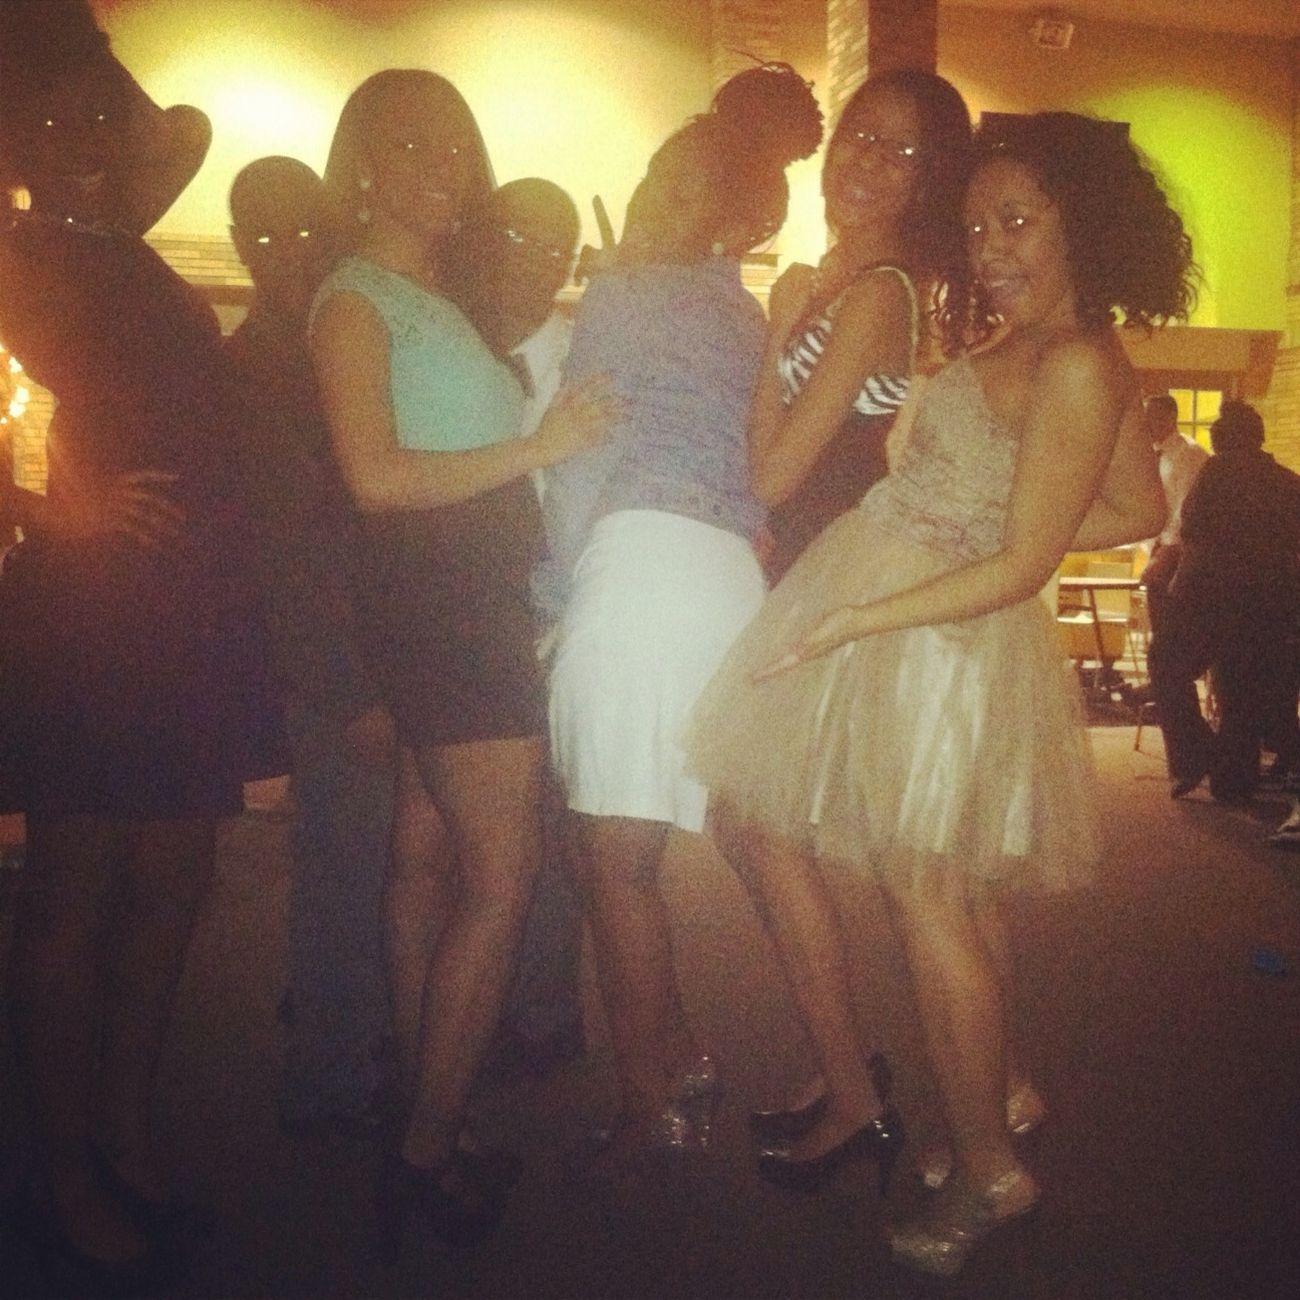 Babes Last Night